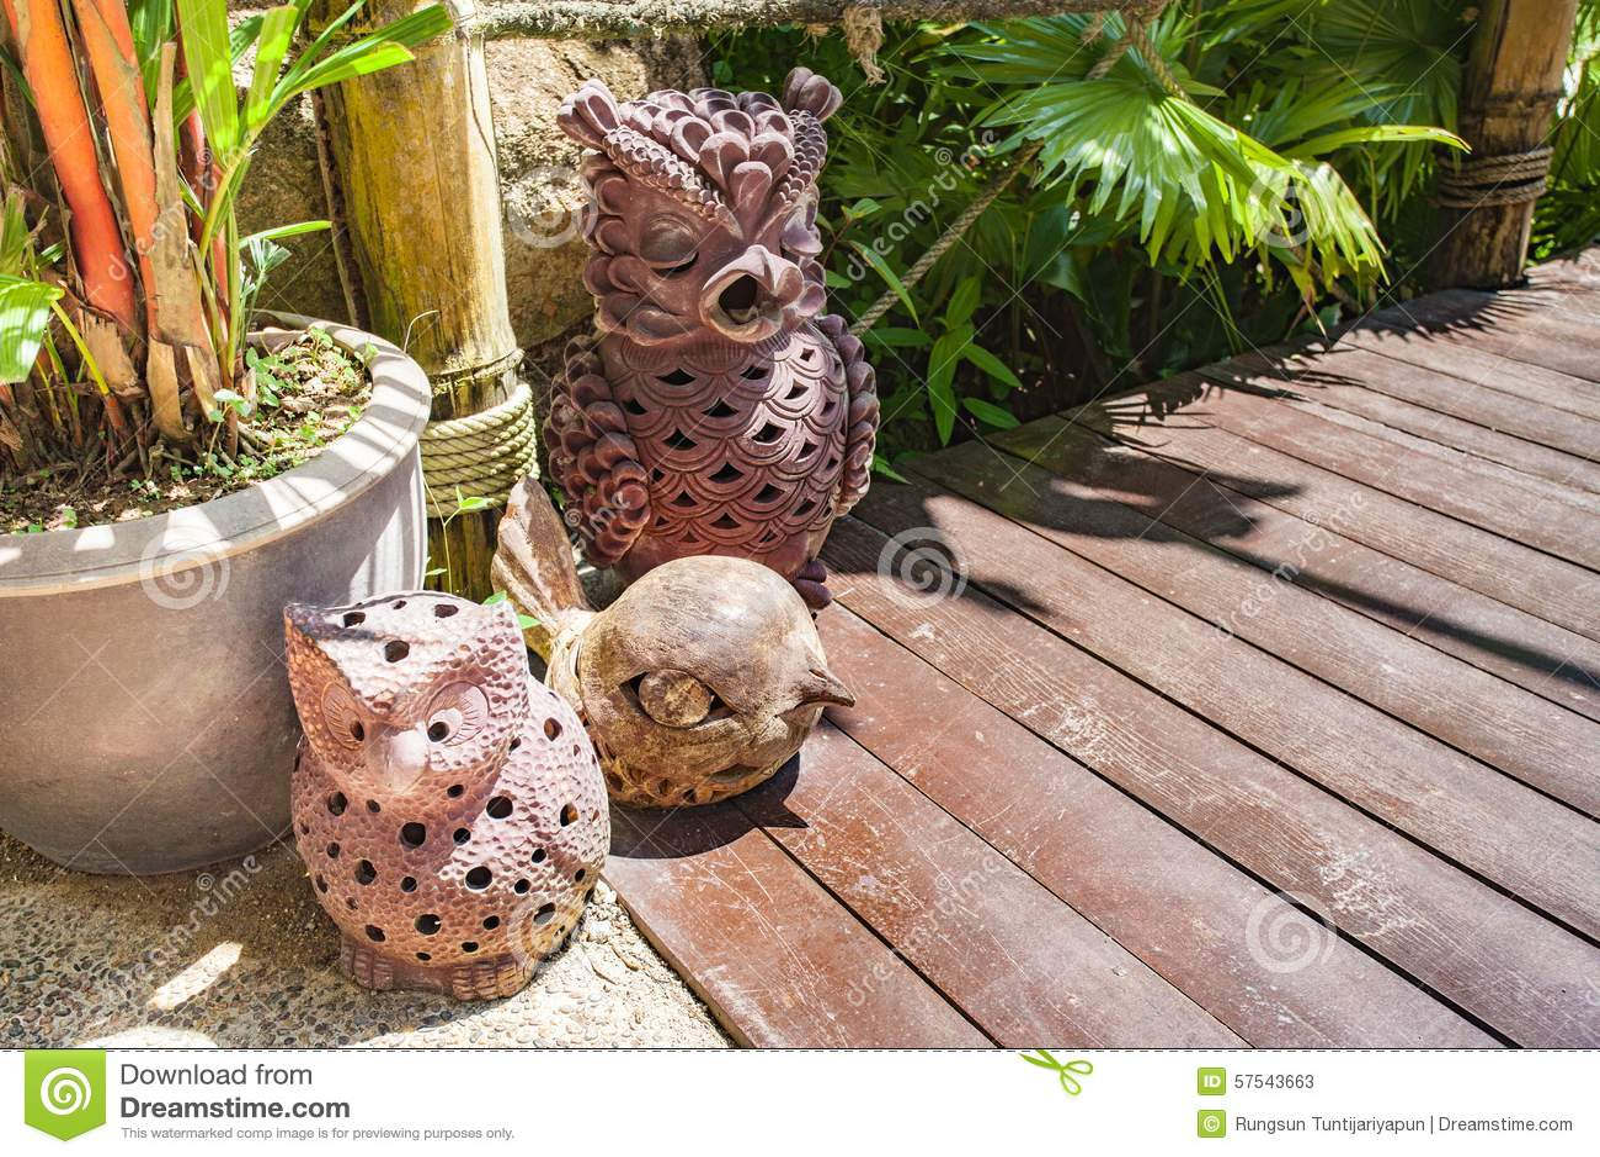 Download Owl Garden Decor Stock Image. Image Of Design, Stick   57543663